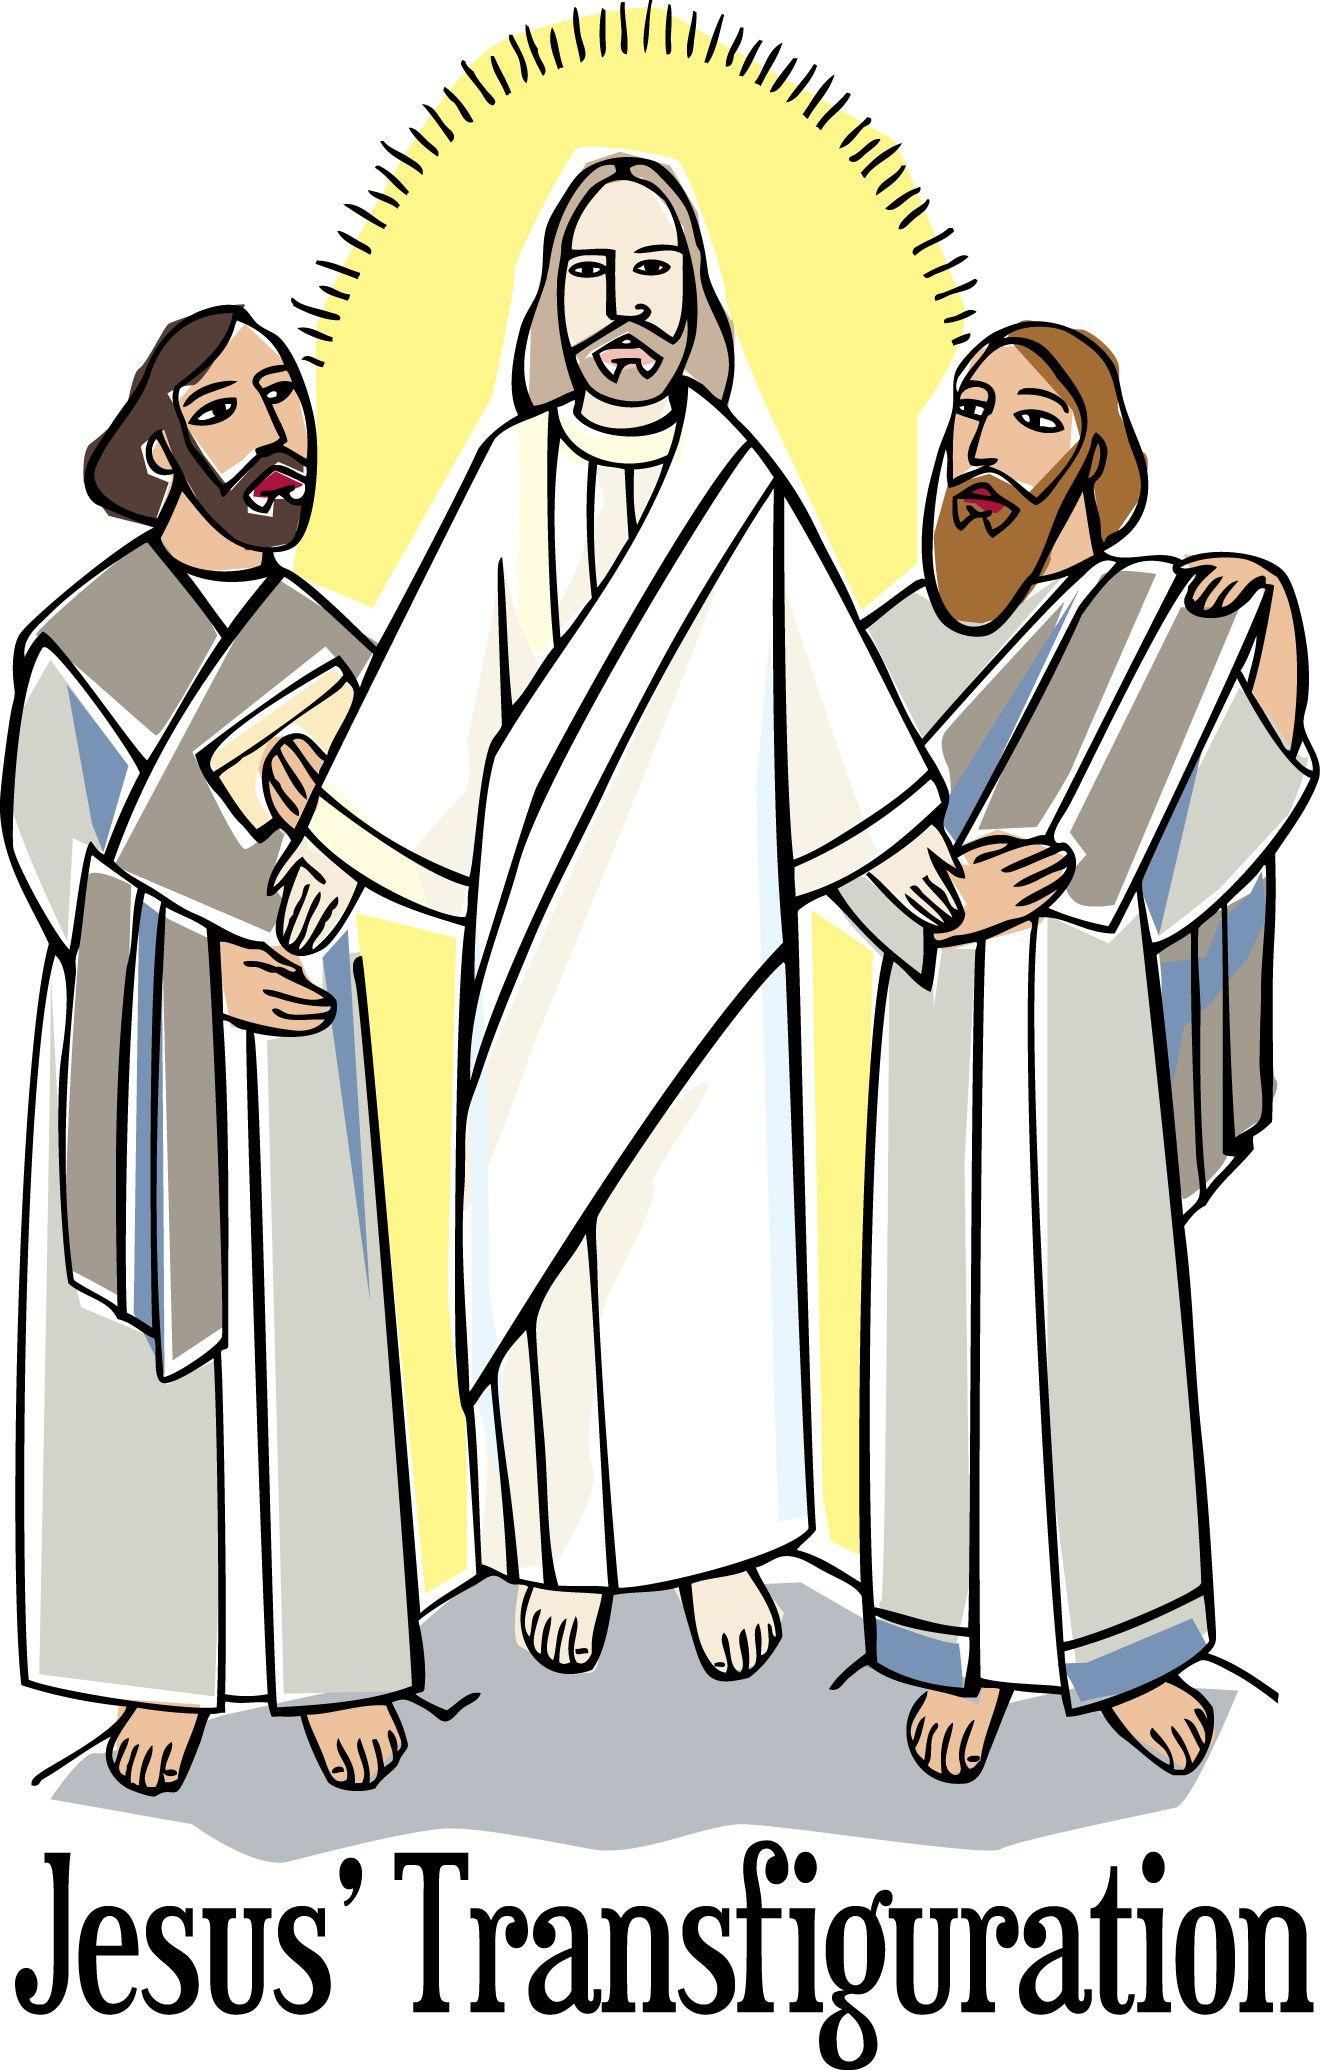 Pin By Sarah Graves On Sunday School Transfiguration Of Christ